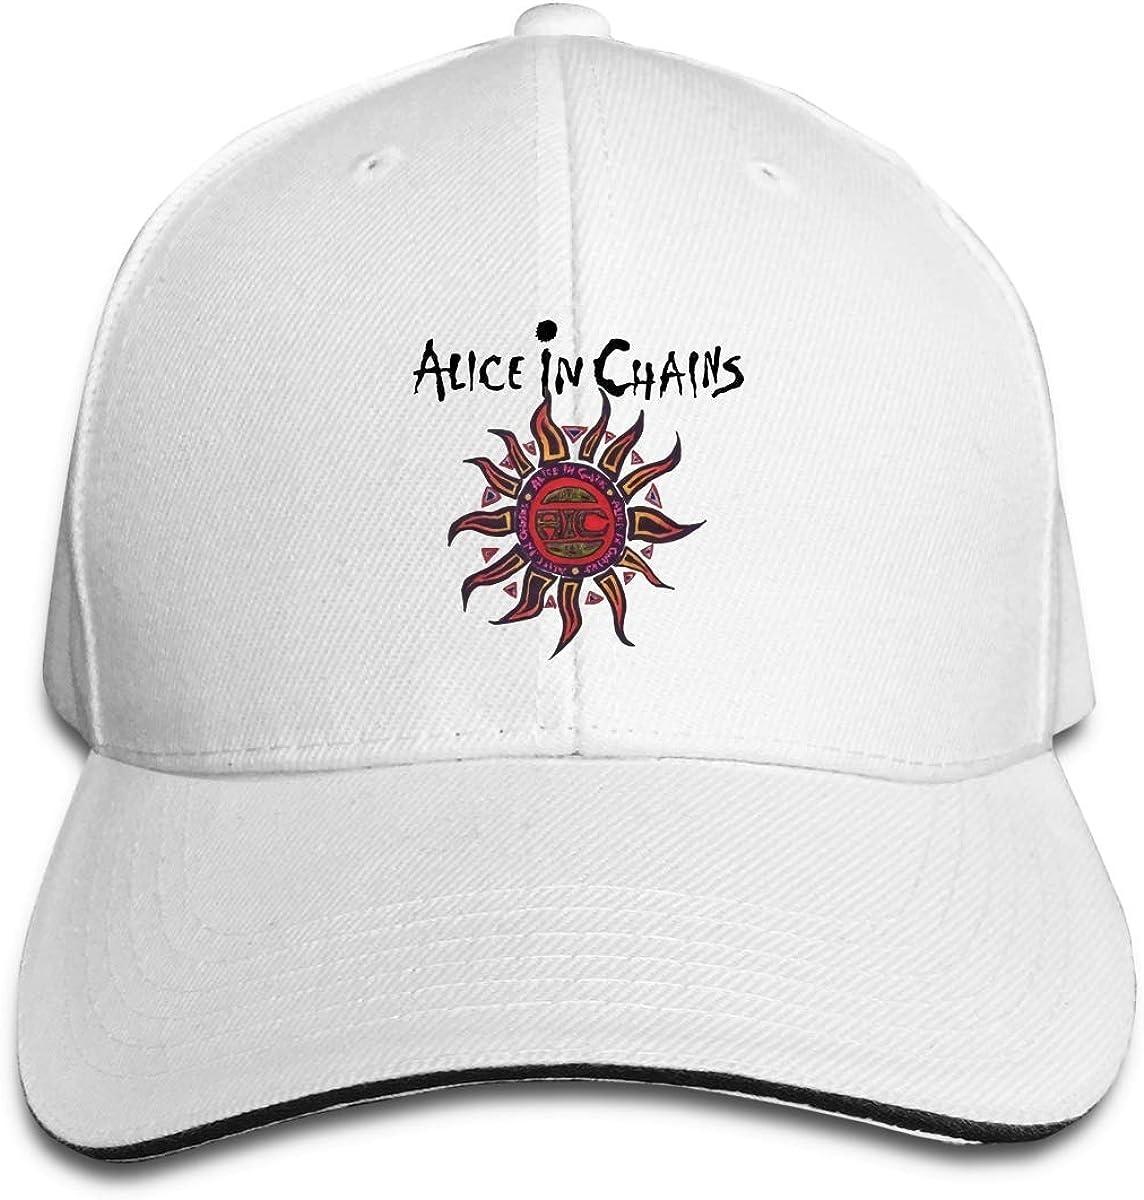 Cotton Sun Hat Flat Cap Stylish Alice in Chains Cap and Baseball Cap